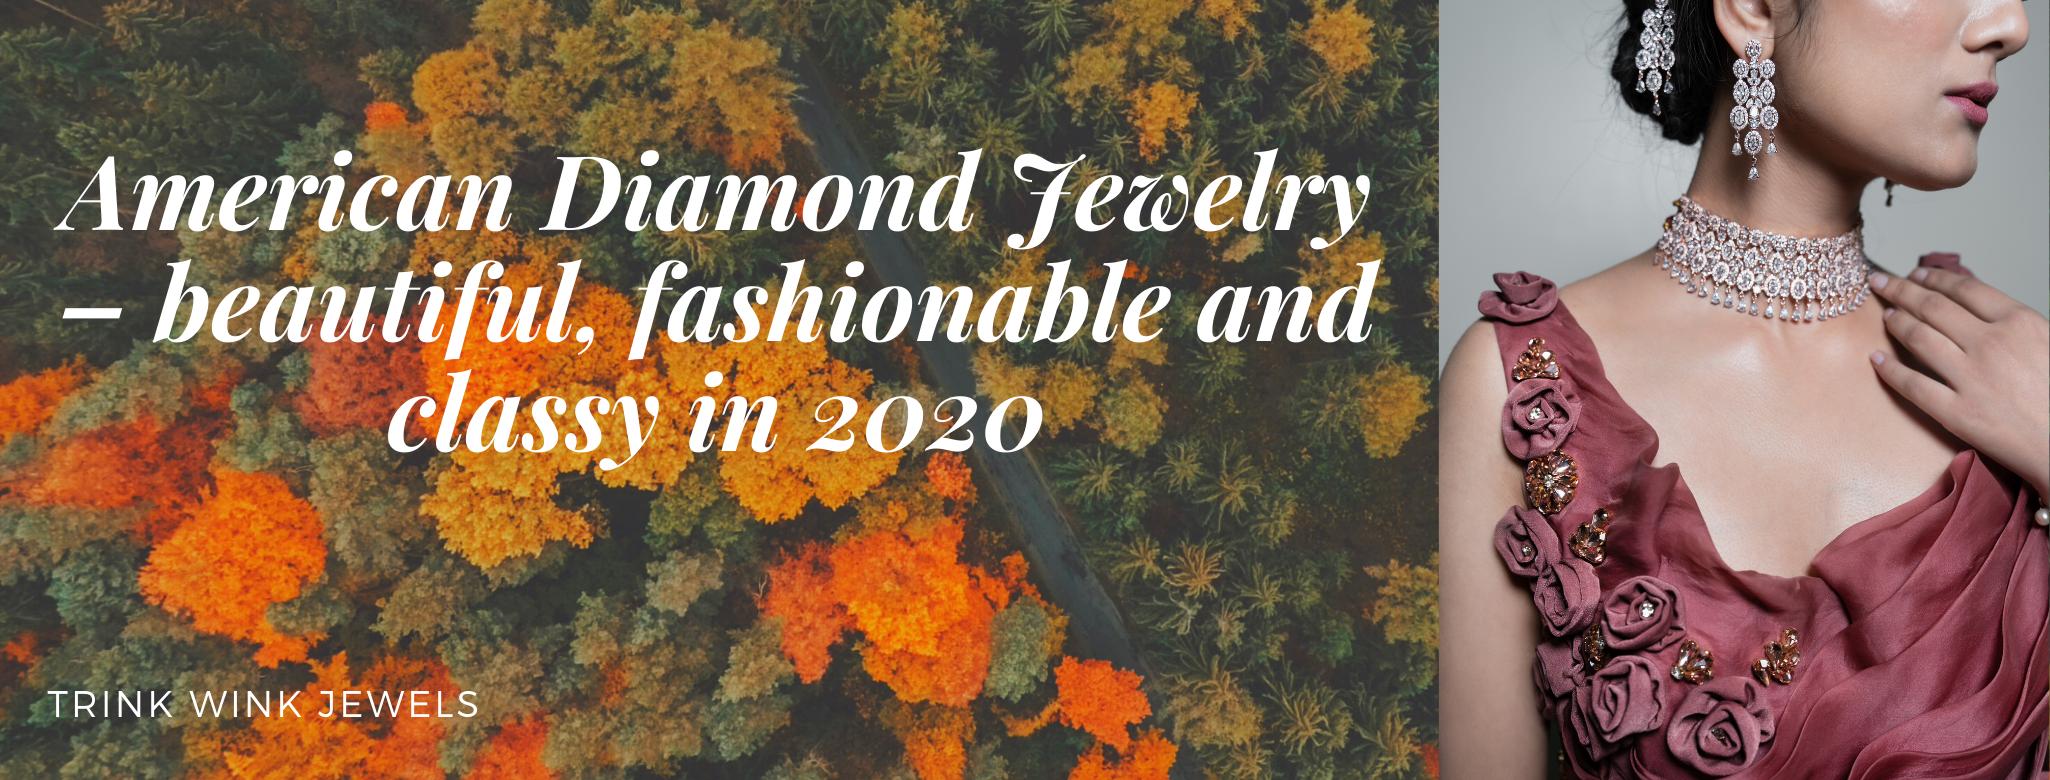 American Diamond Jewelry – beautiful, fashionable and classy in 2020